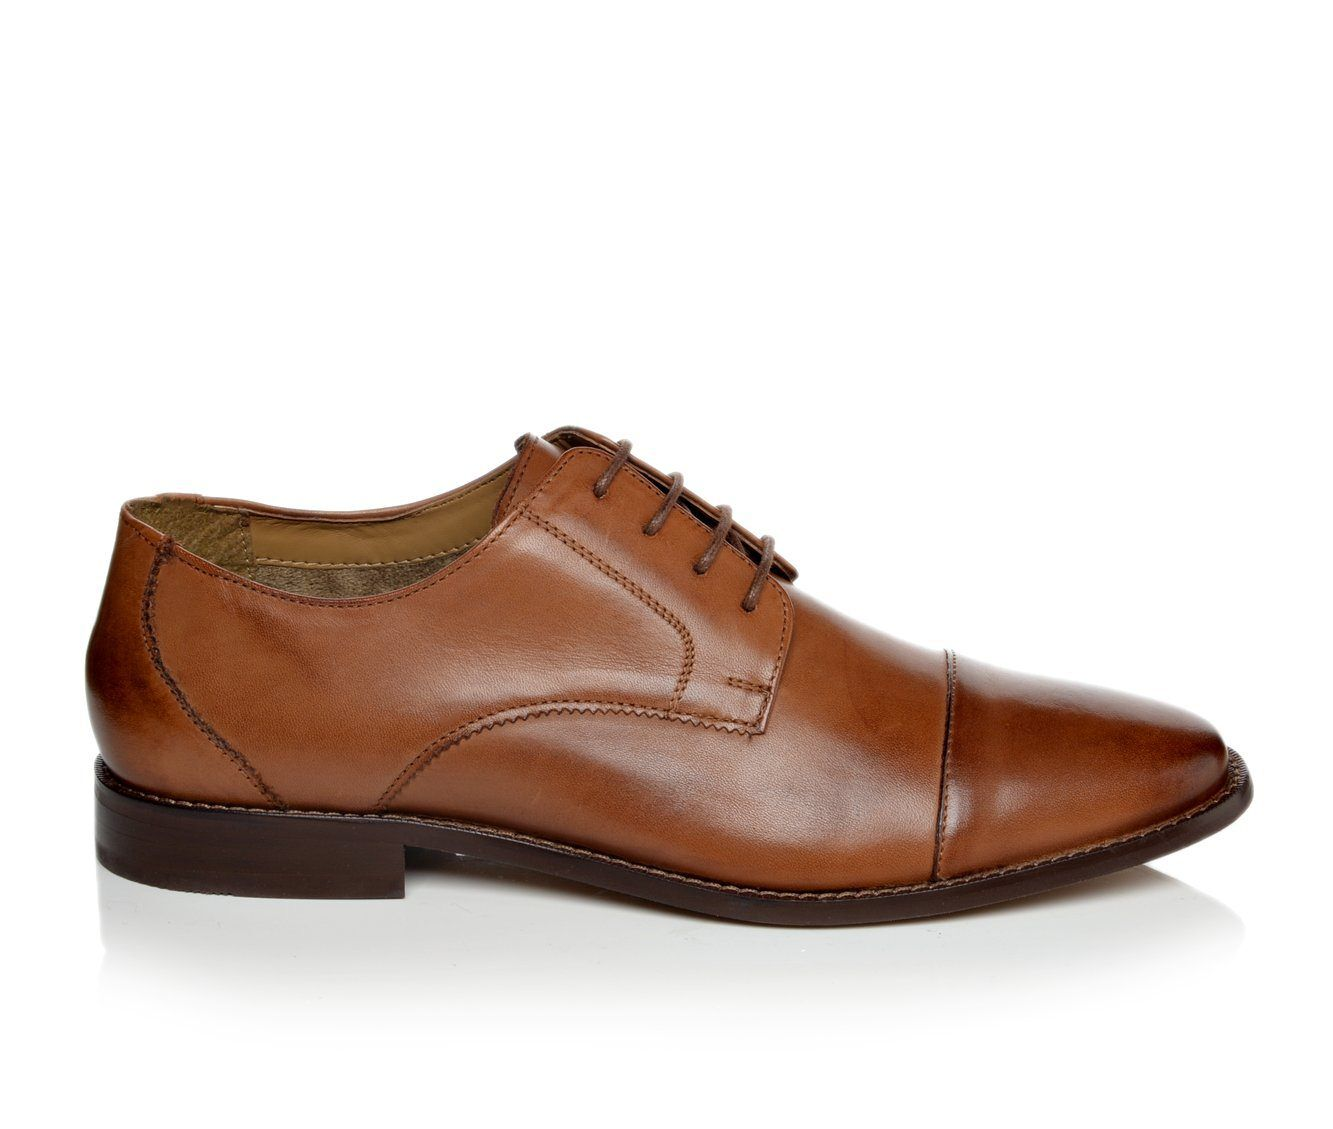 Florsheim Shoes  Florsheim Montinaro Cap Toe Mens Dress Brown